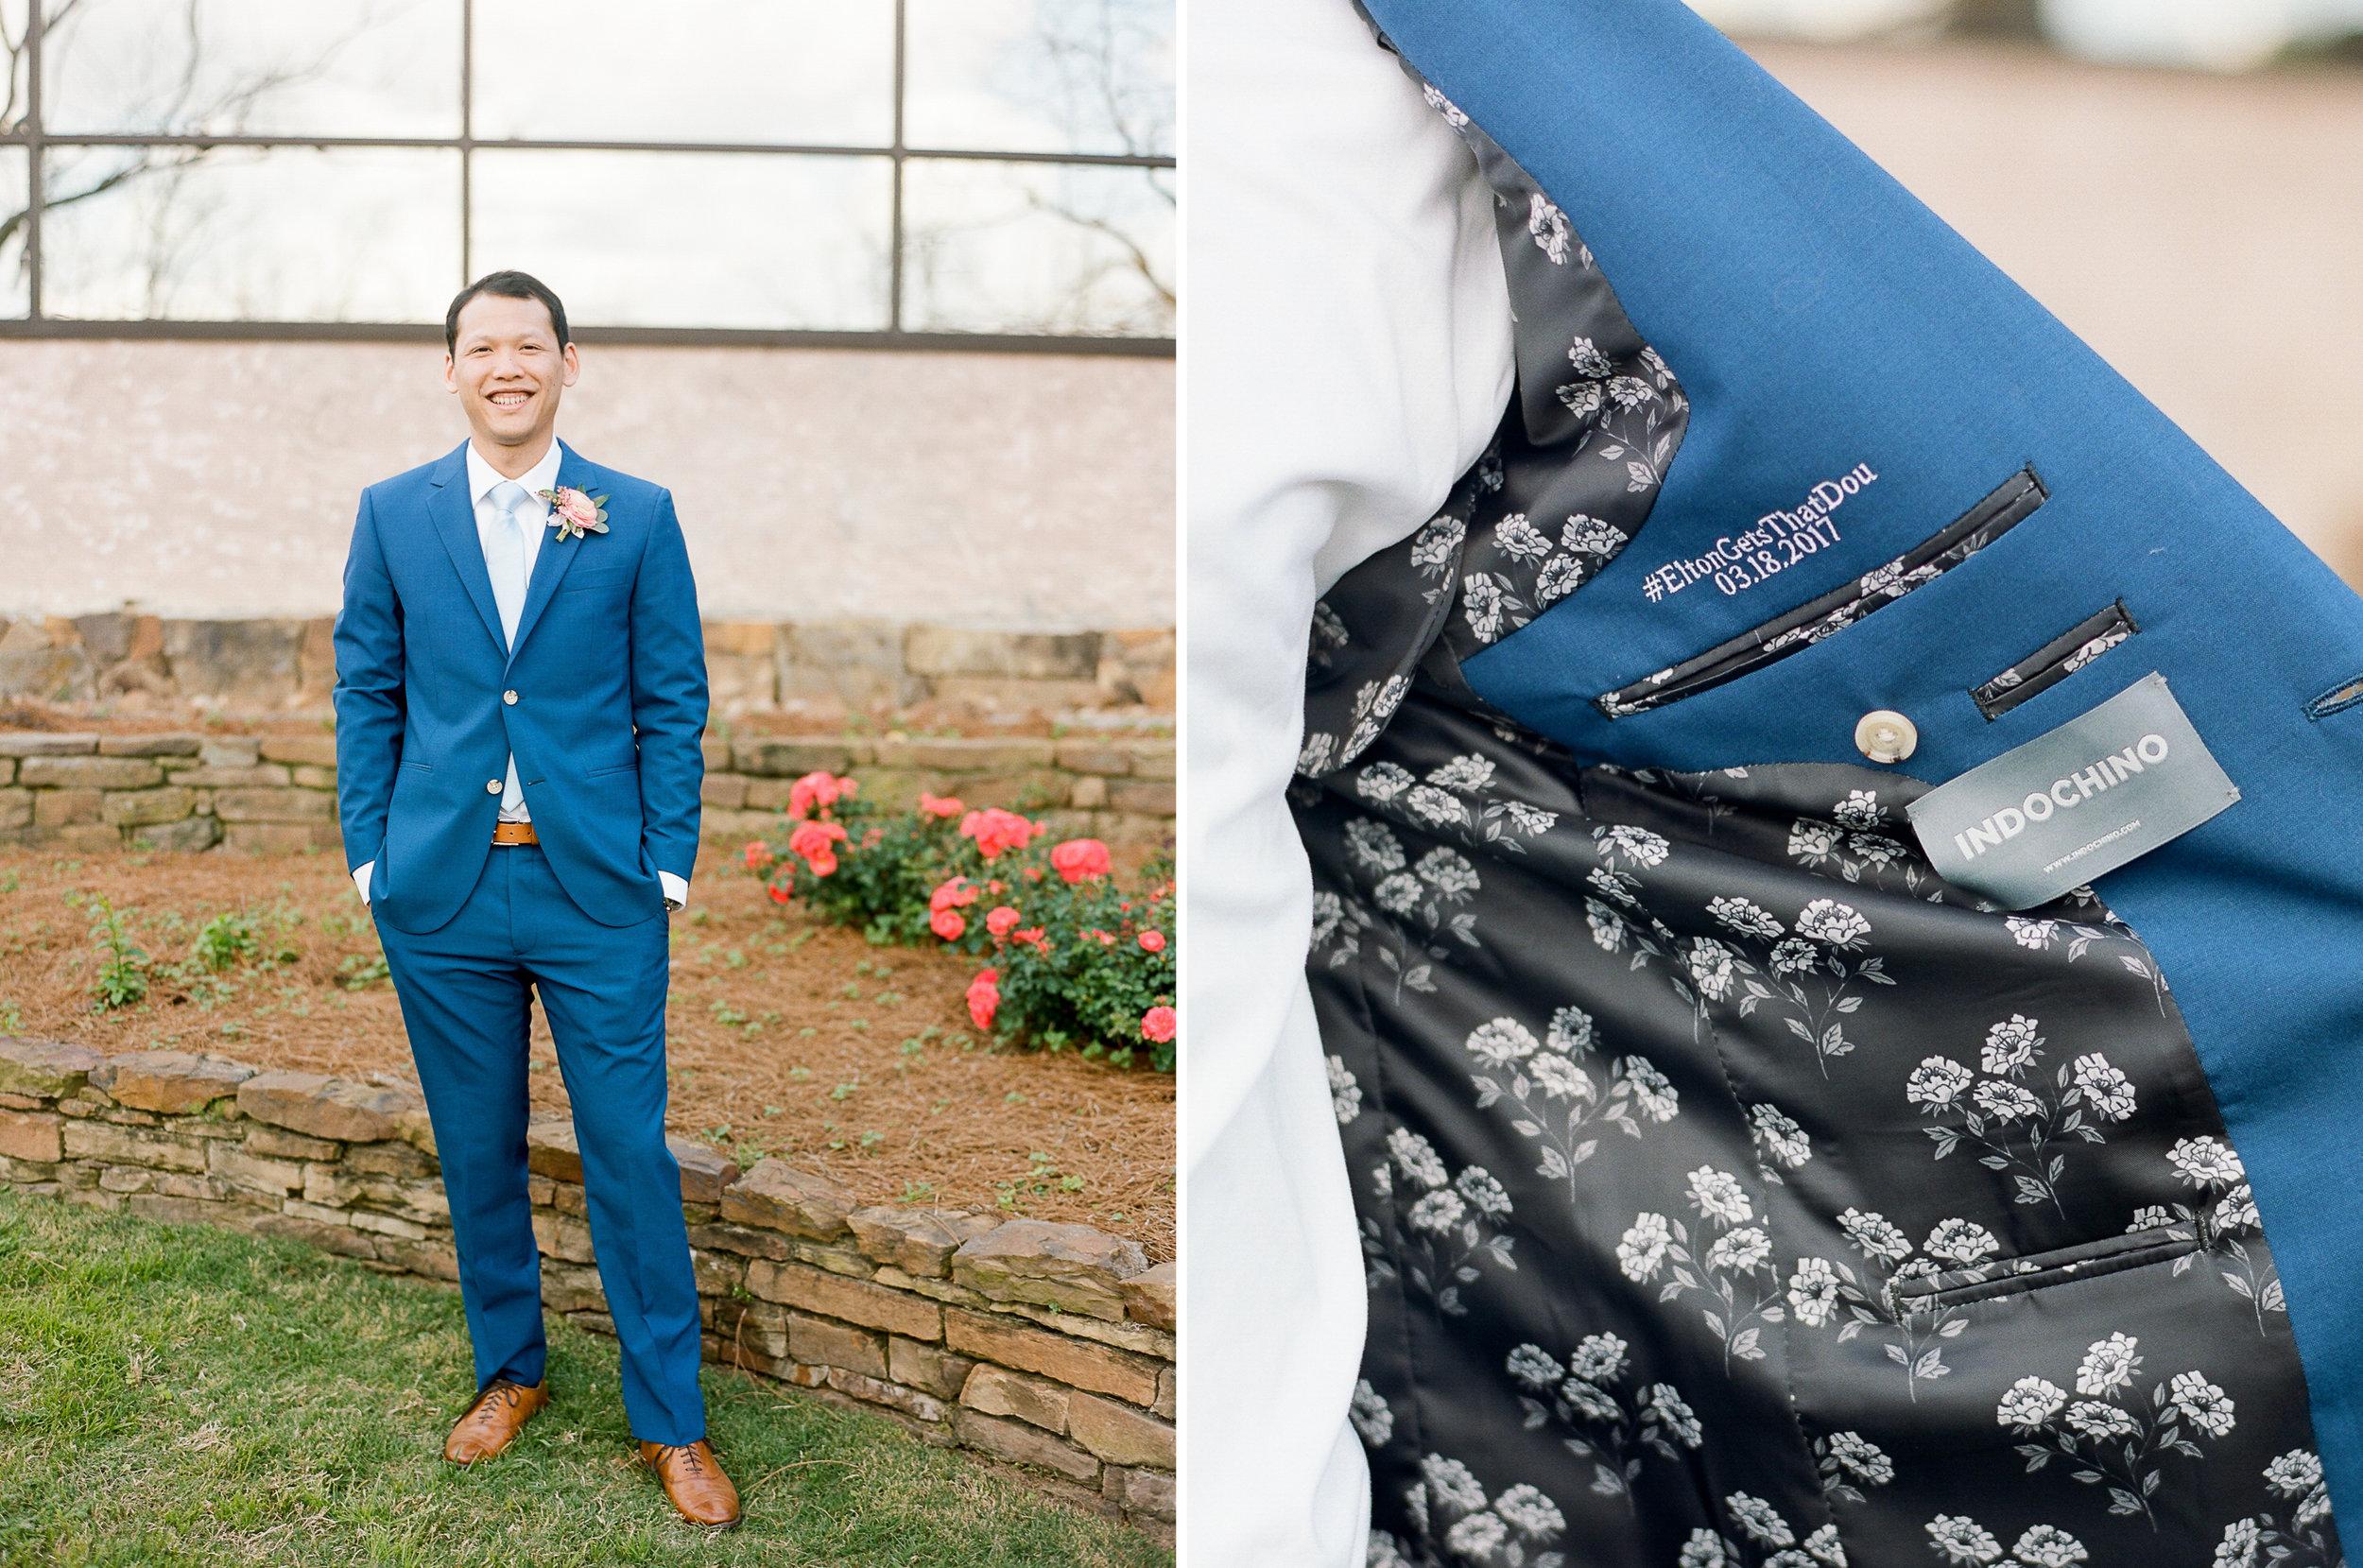 The-Knot-50-Weddings-50-States-Texas-Winner-Dana-Fernandez-photography-houston-wedding-photographer-film-fine-art-destination-112.jpg